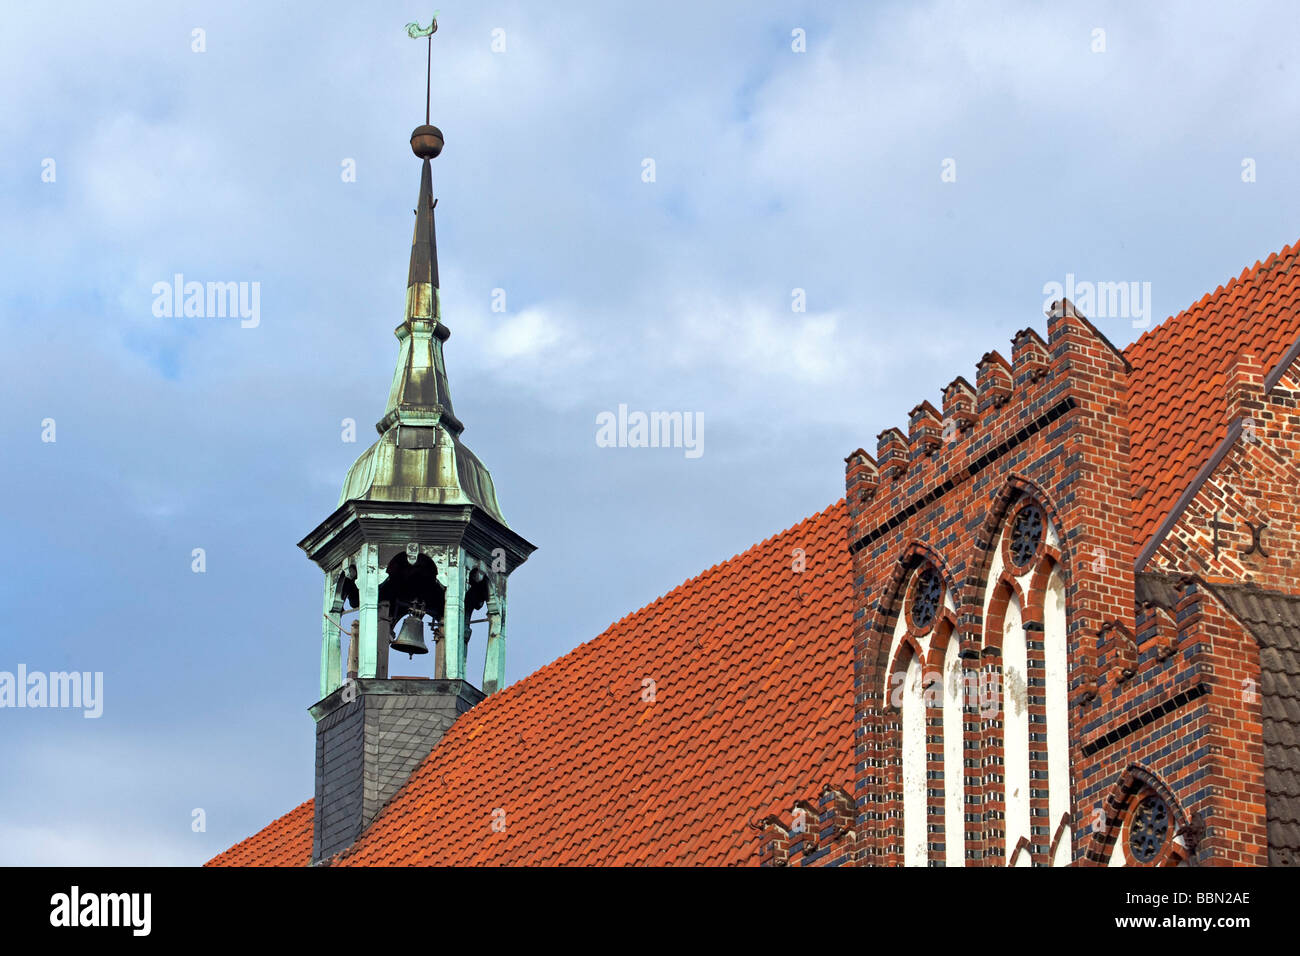 Heiligen-Geist-Kirche, Holy Spirit Church, Wismar, Mecklenburg-Western Pomerania, Germany, Europe - Stock Image